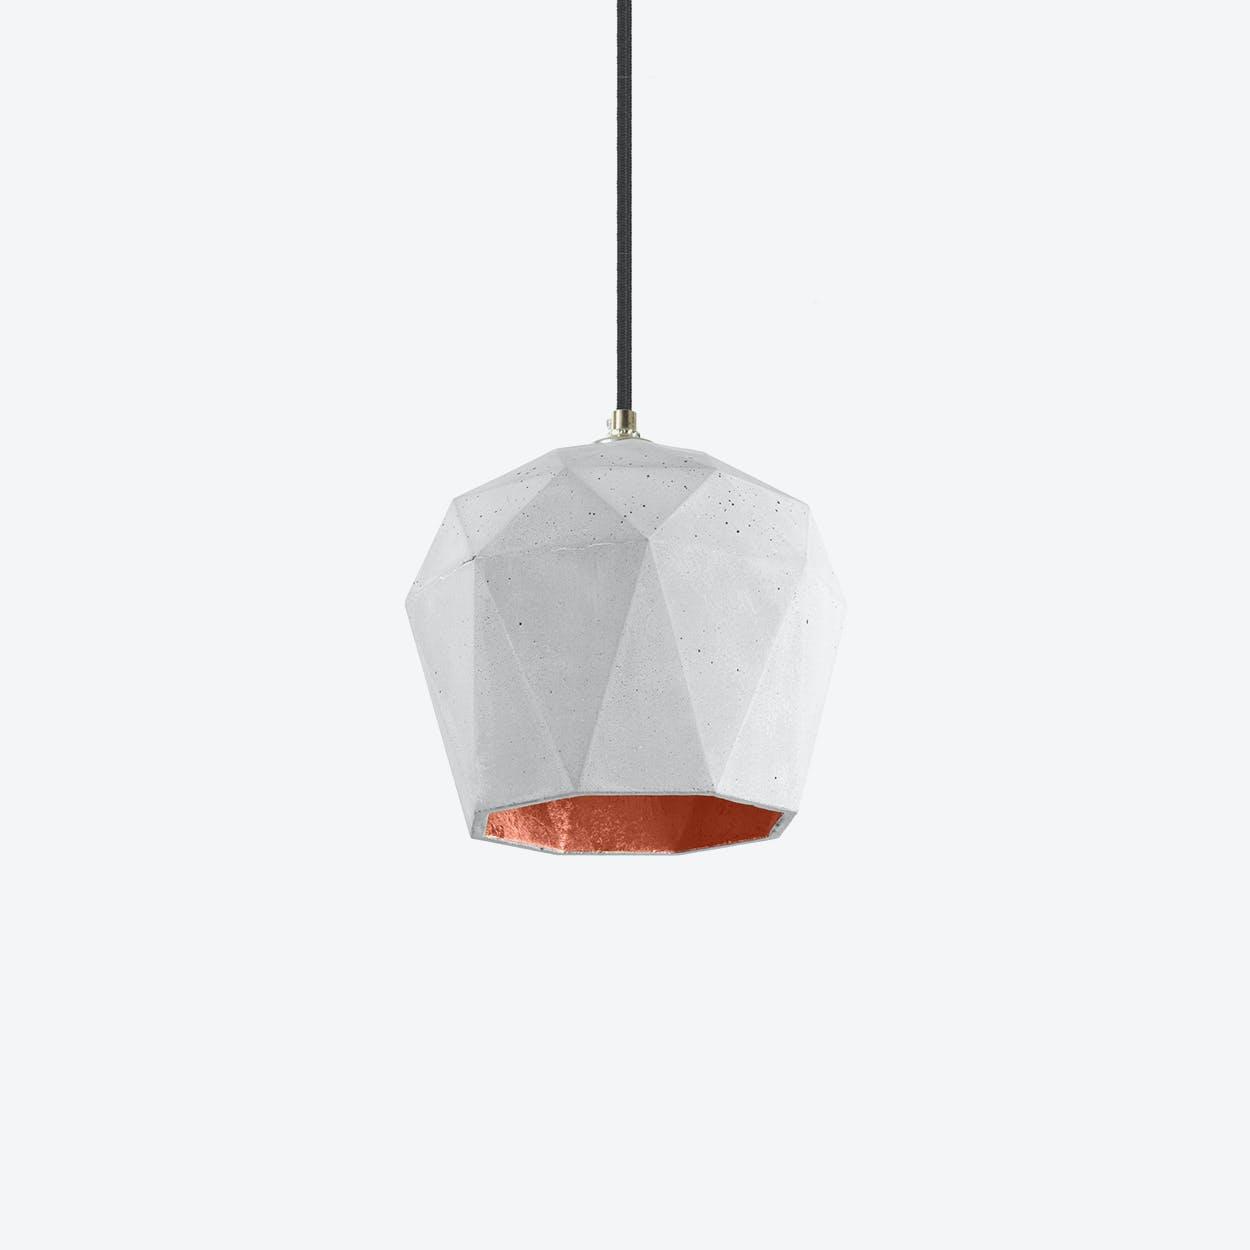 Concrete Pendant Light Triangle T3 in Light Grey and Copper